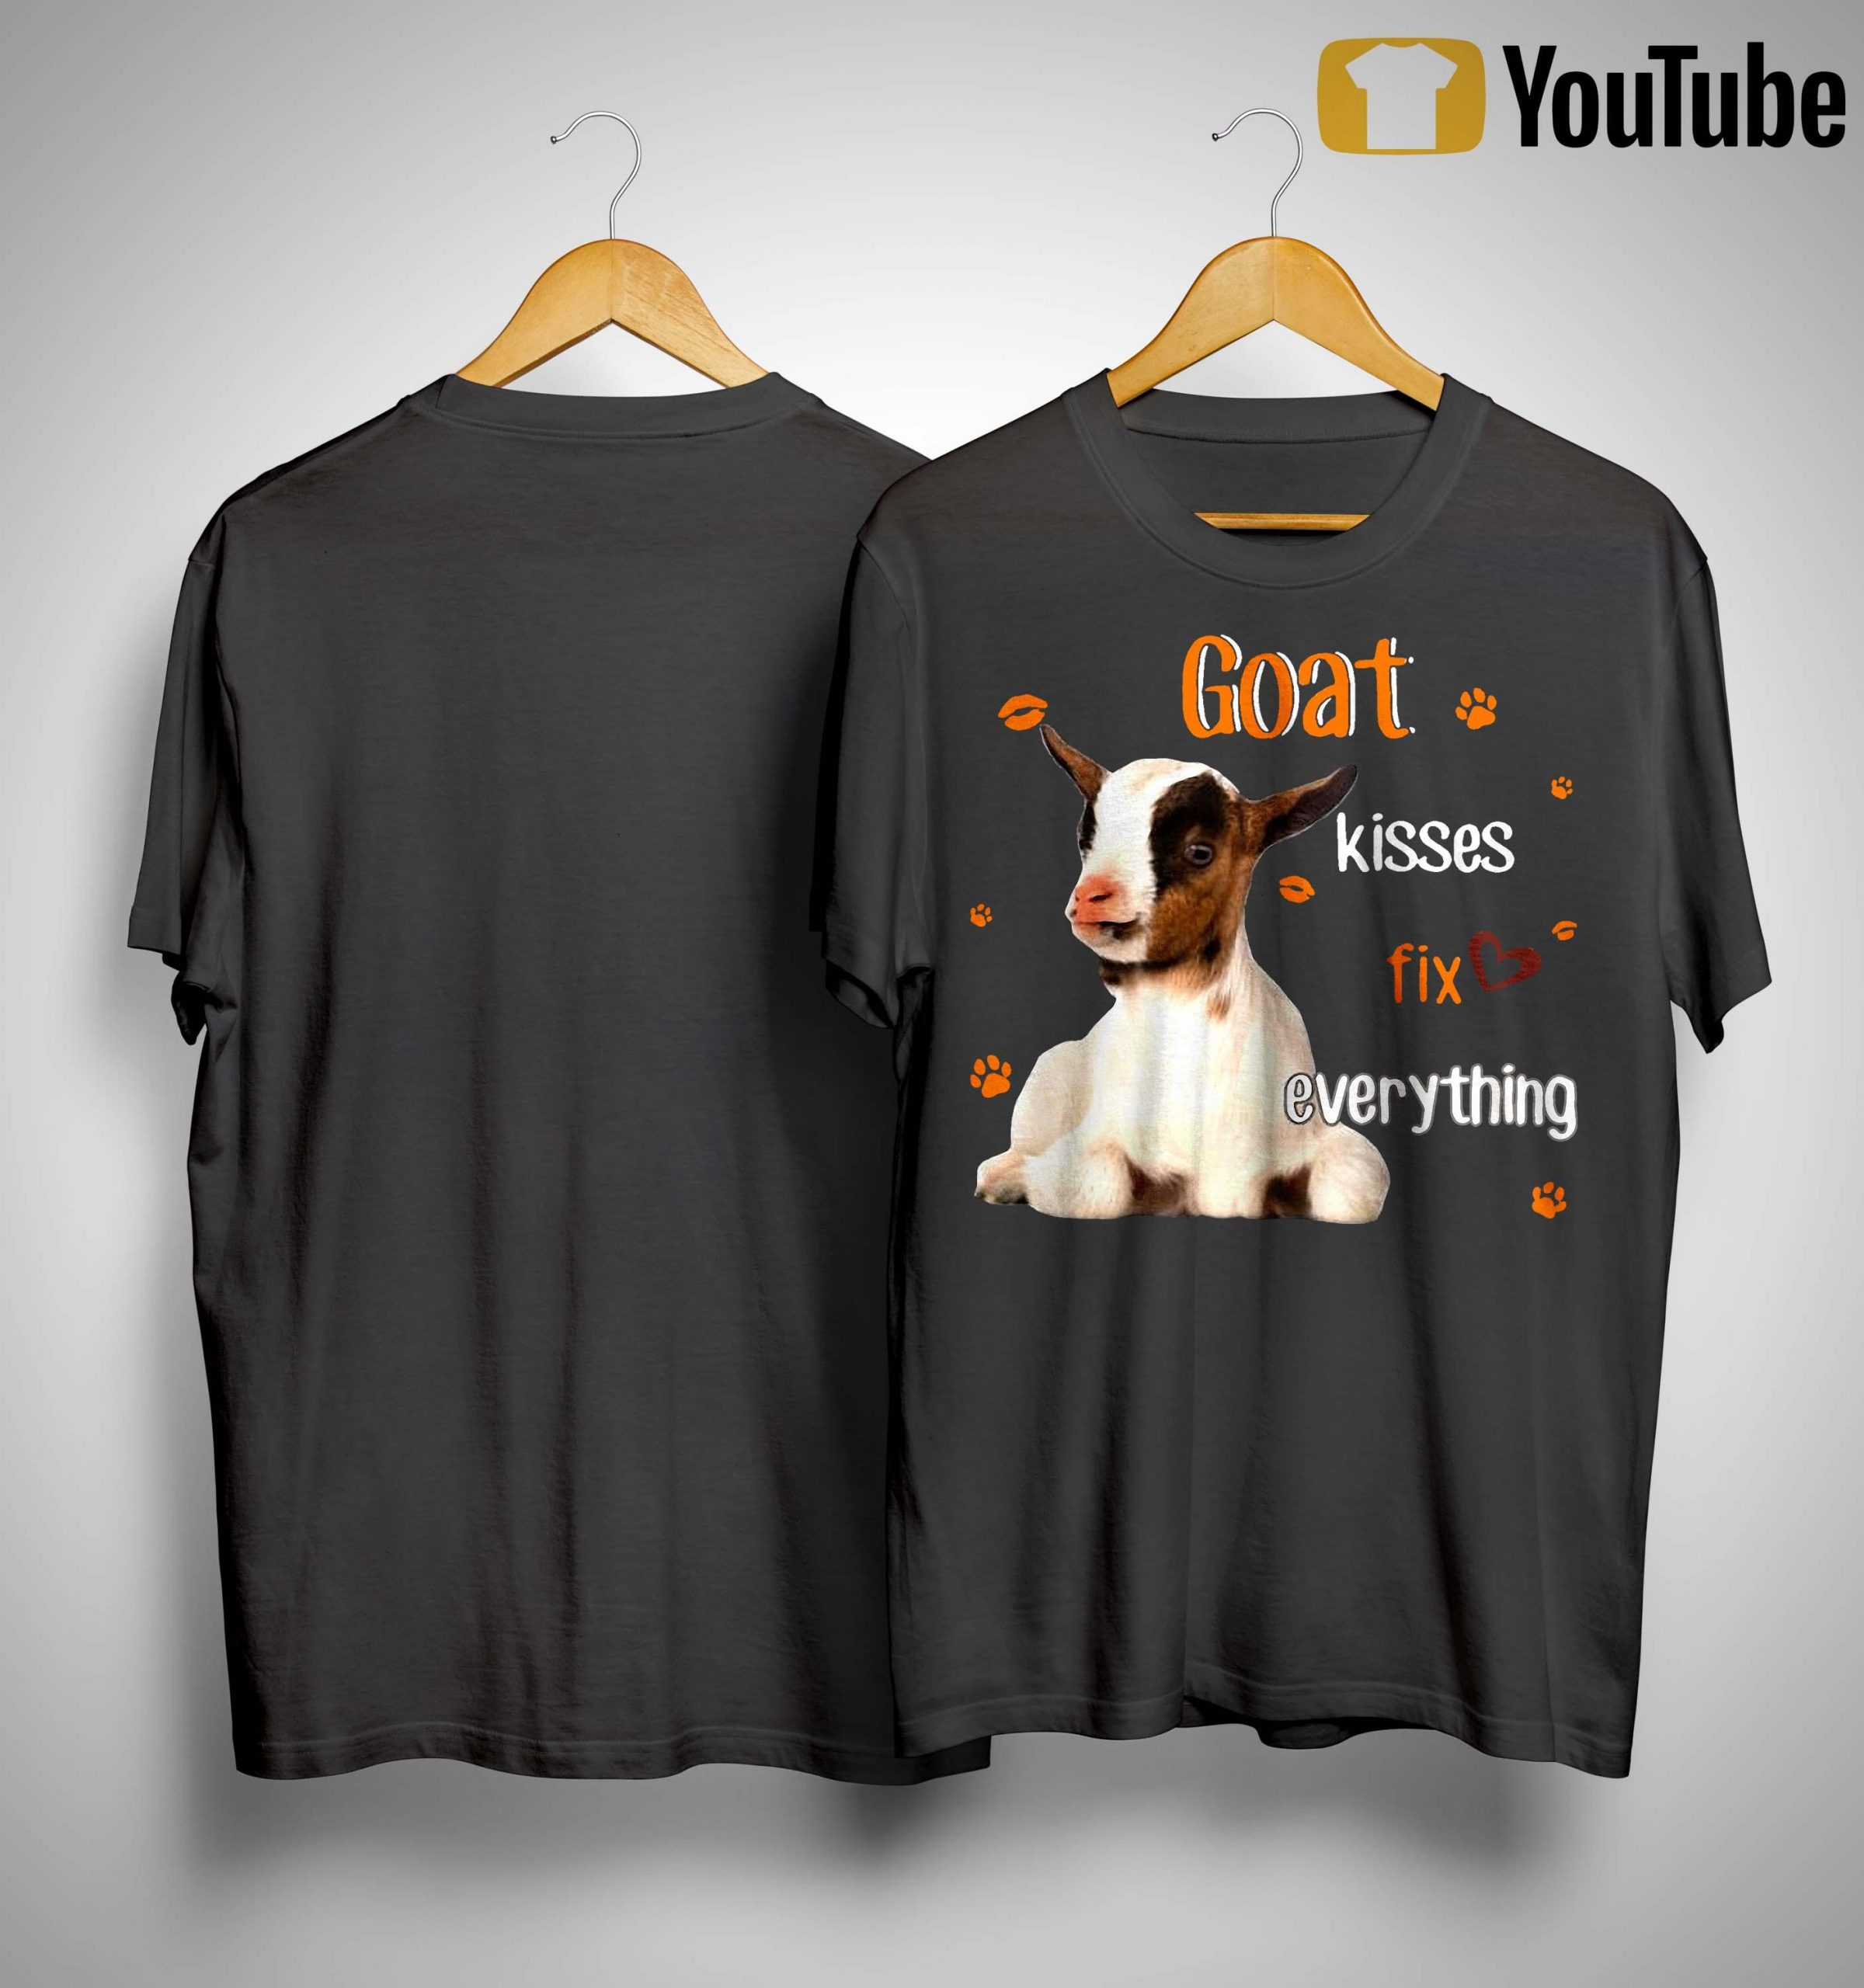 Goat Kisses Fix Everything Shirt